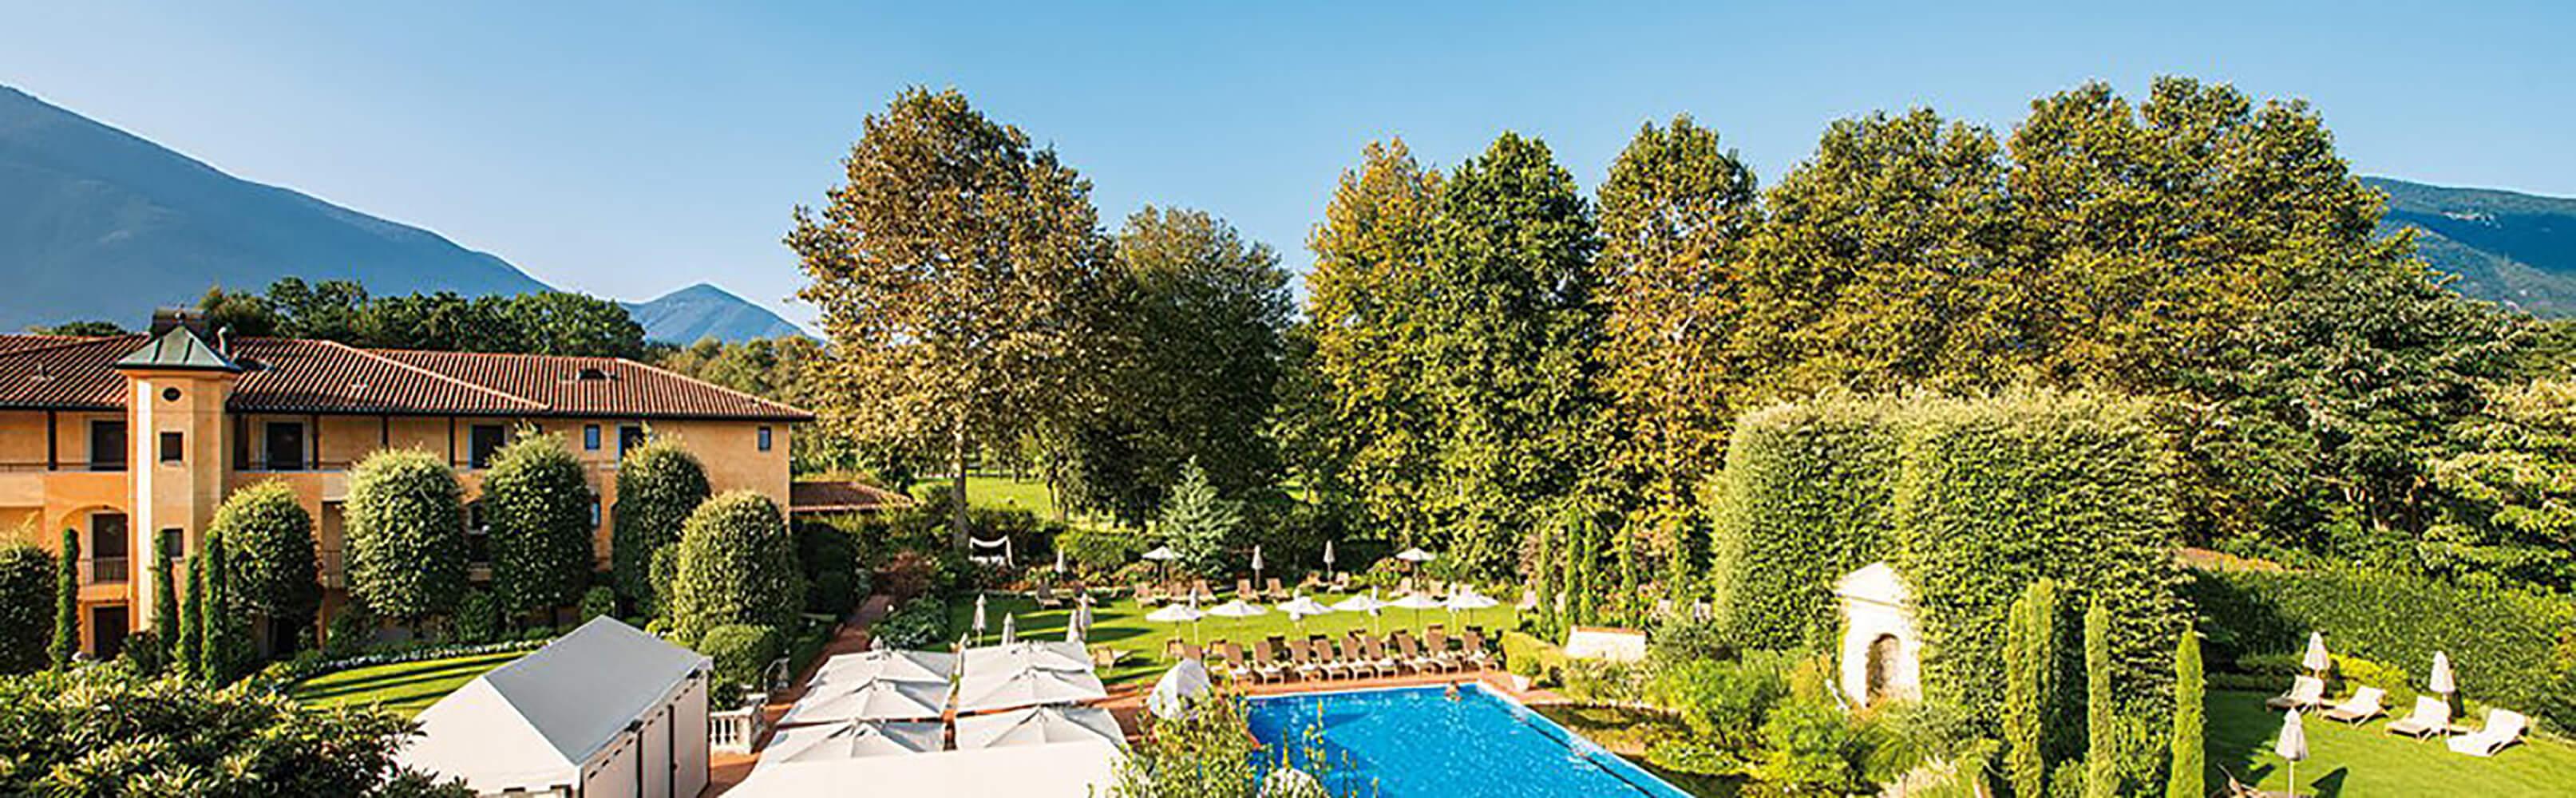 Hotel Giardino Ascona 1